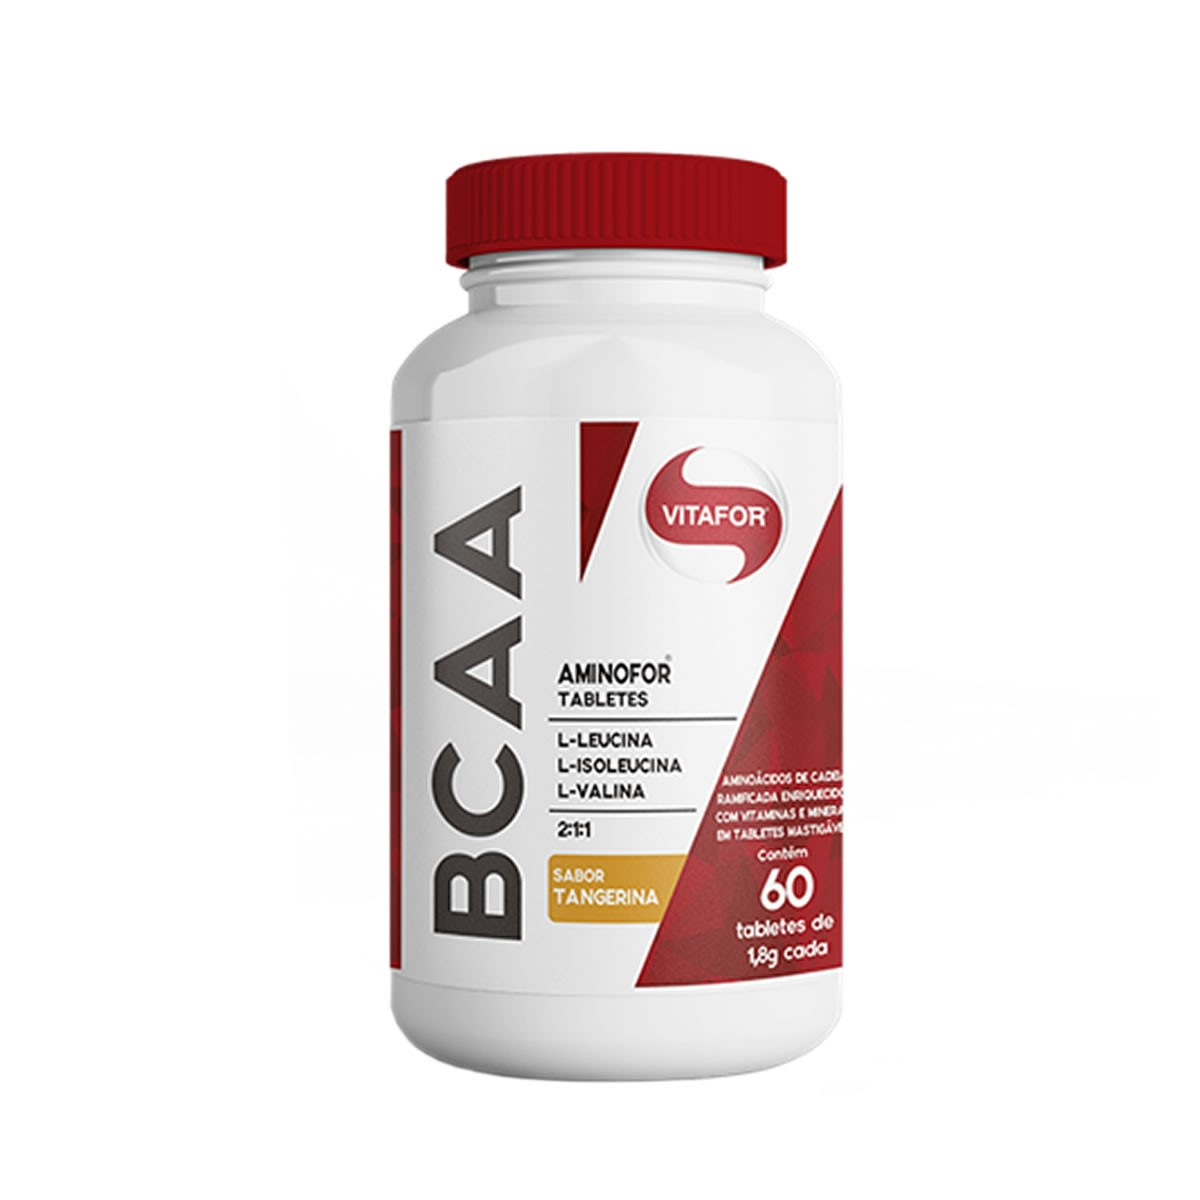 BCAA Aminofor Sabor Tangerina 1800mg 60 Tabletes - Vitafor